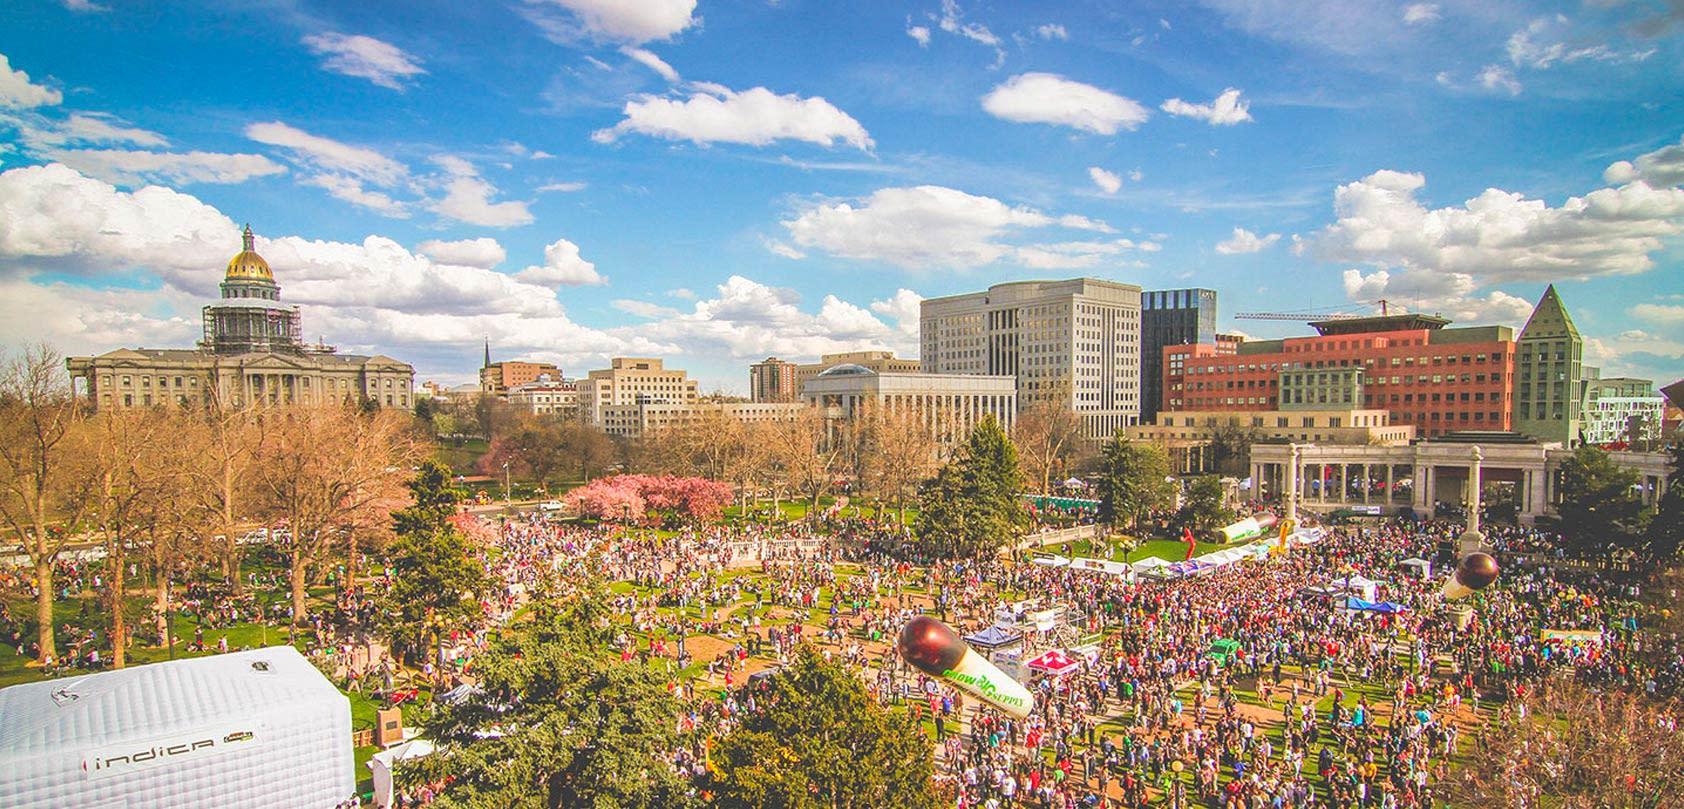 Native Roots Dispensary 420 Rally in Civic Center Park Denver Colorado 2016